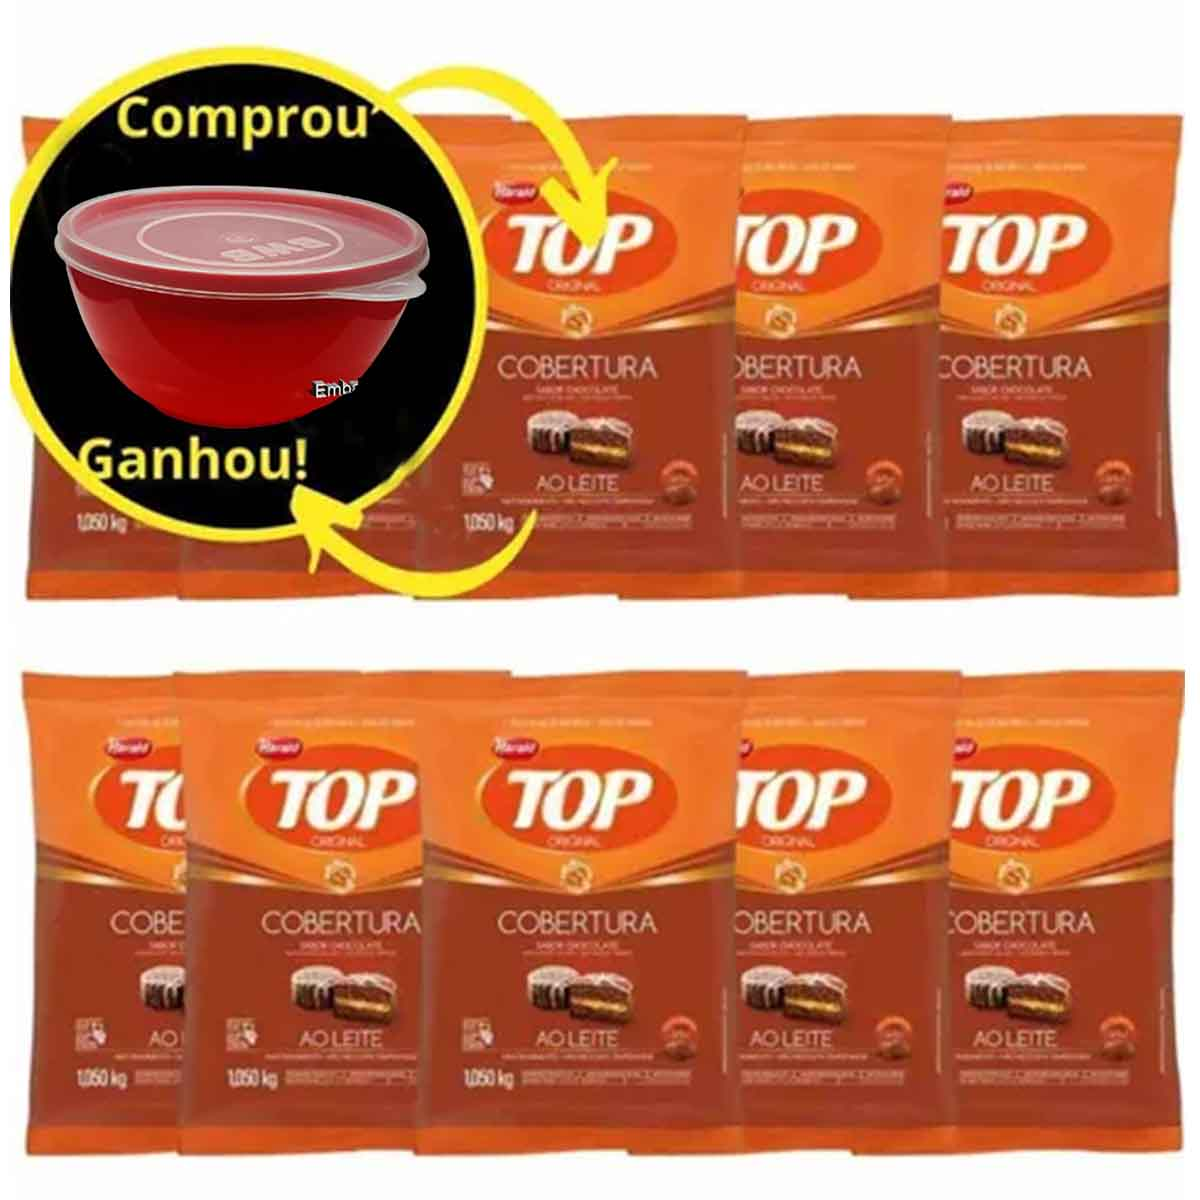 Kit C/10 Cobertura Fracionada sabor chocolate ao Leite Gotas 1,05 kg Top Harald